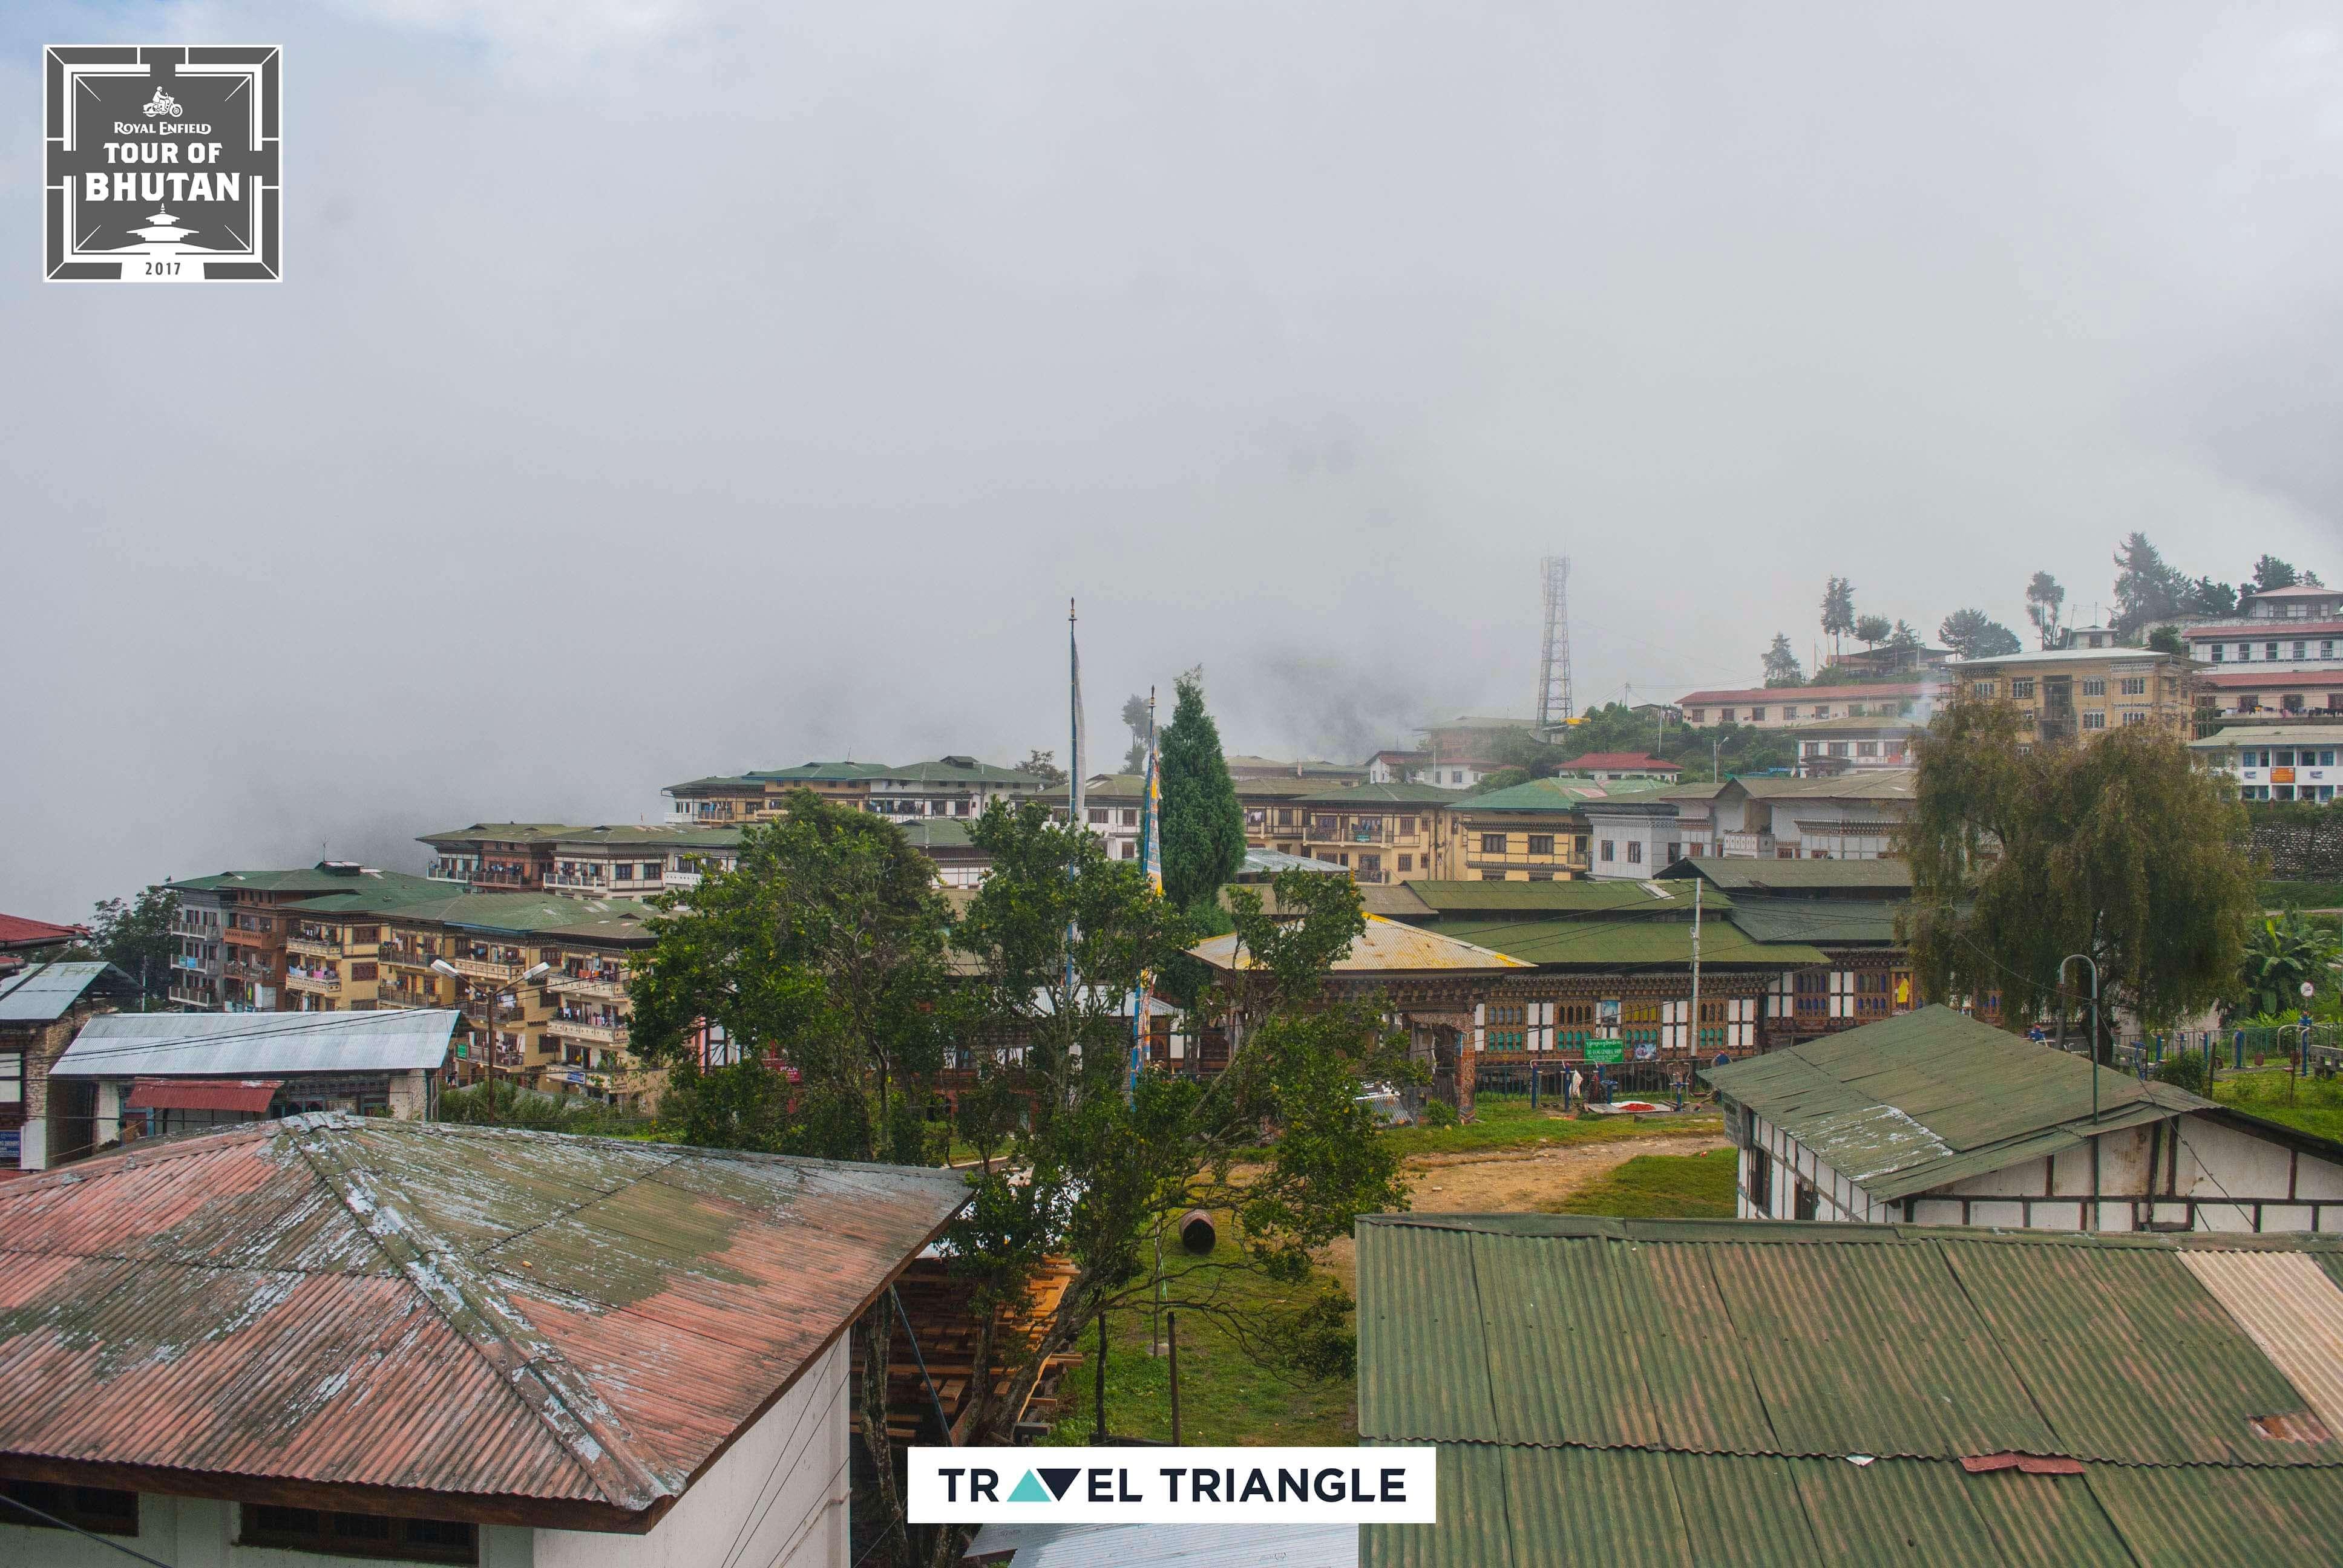 Mongar to Trashigang: the city